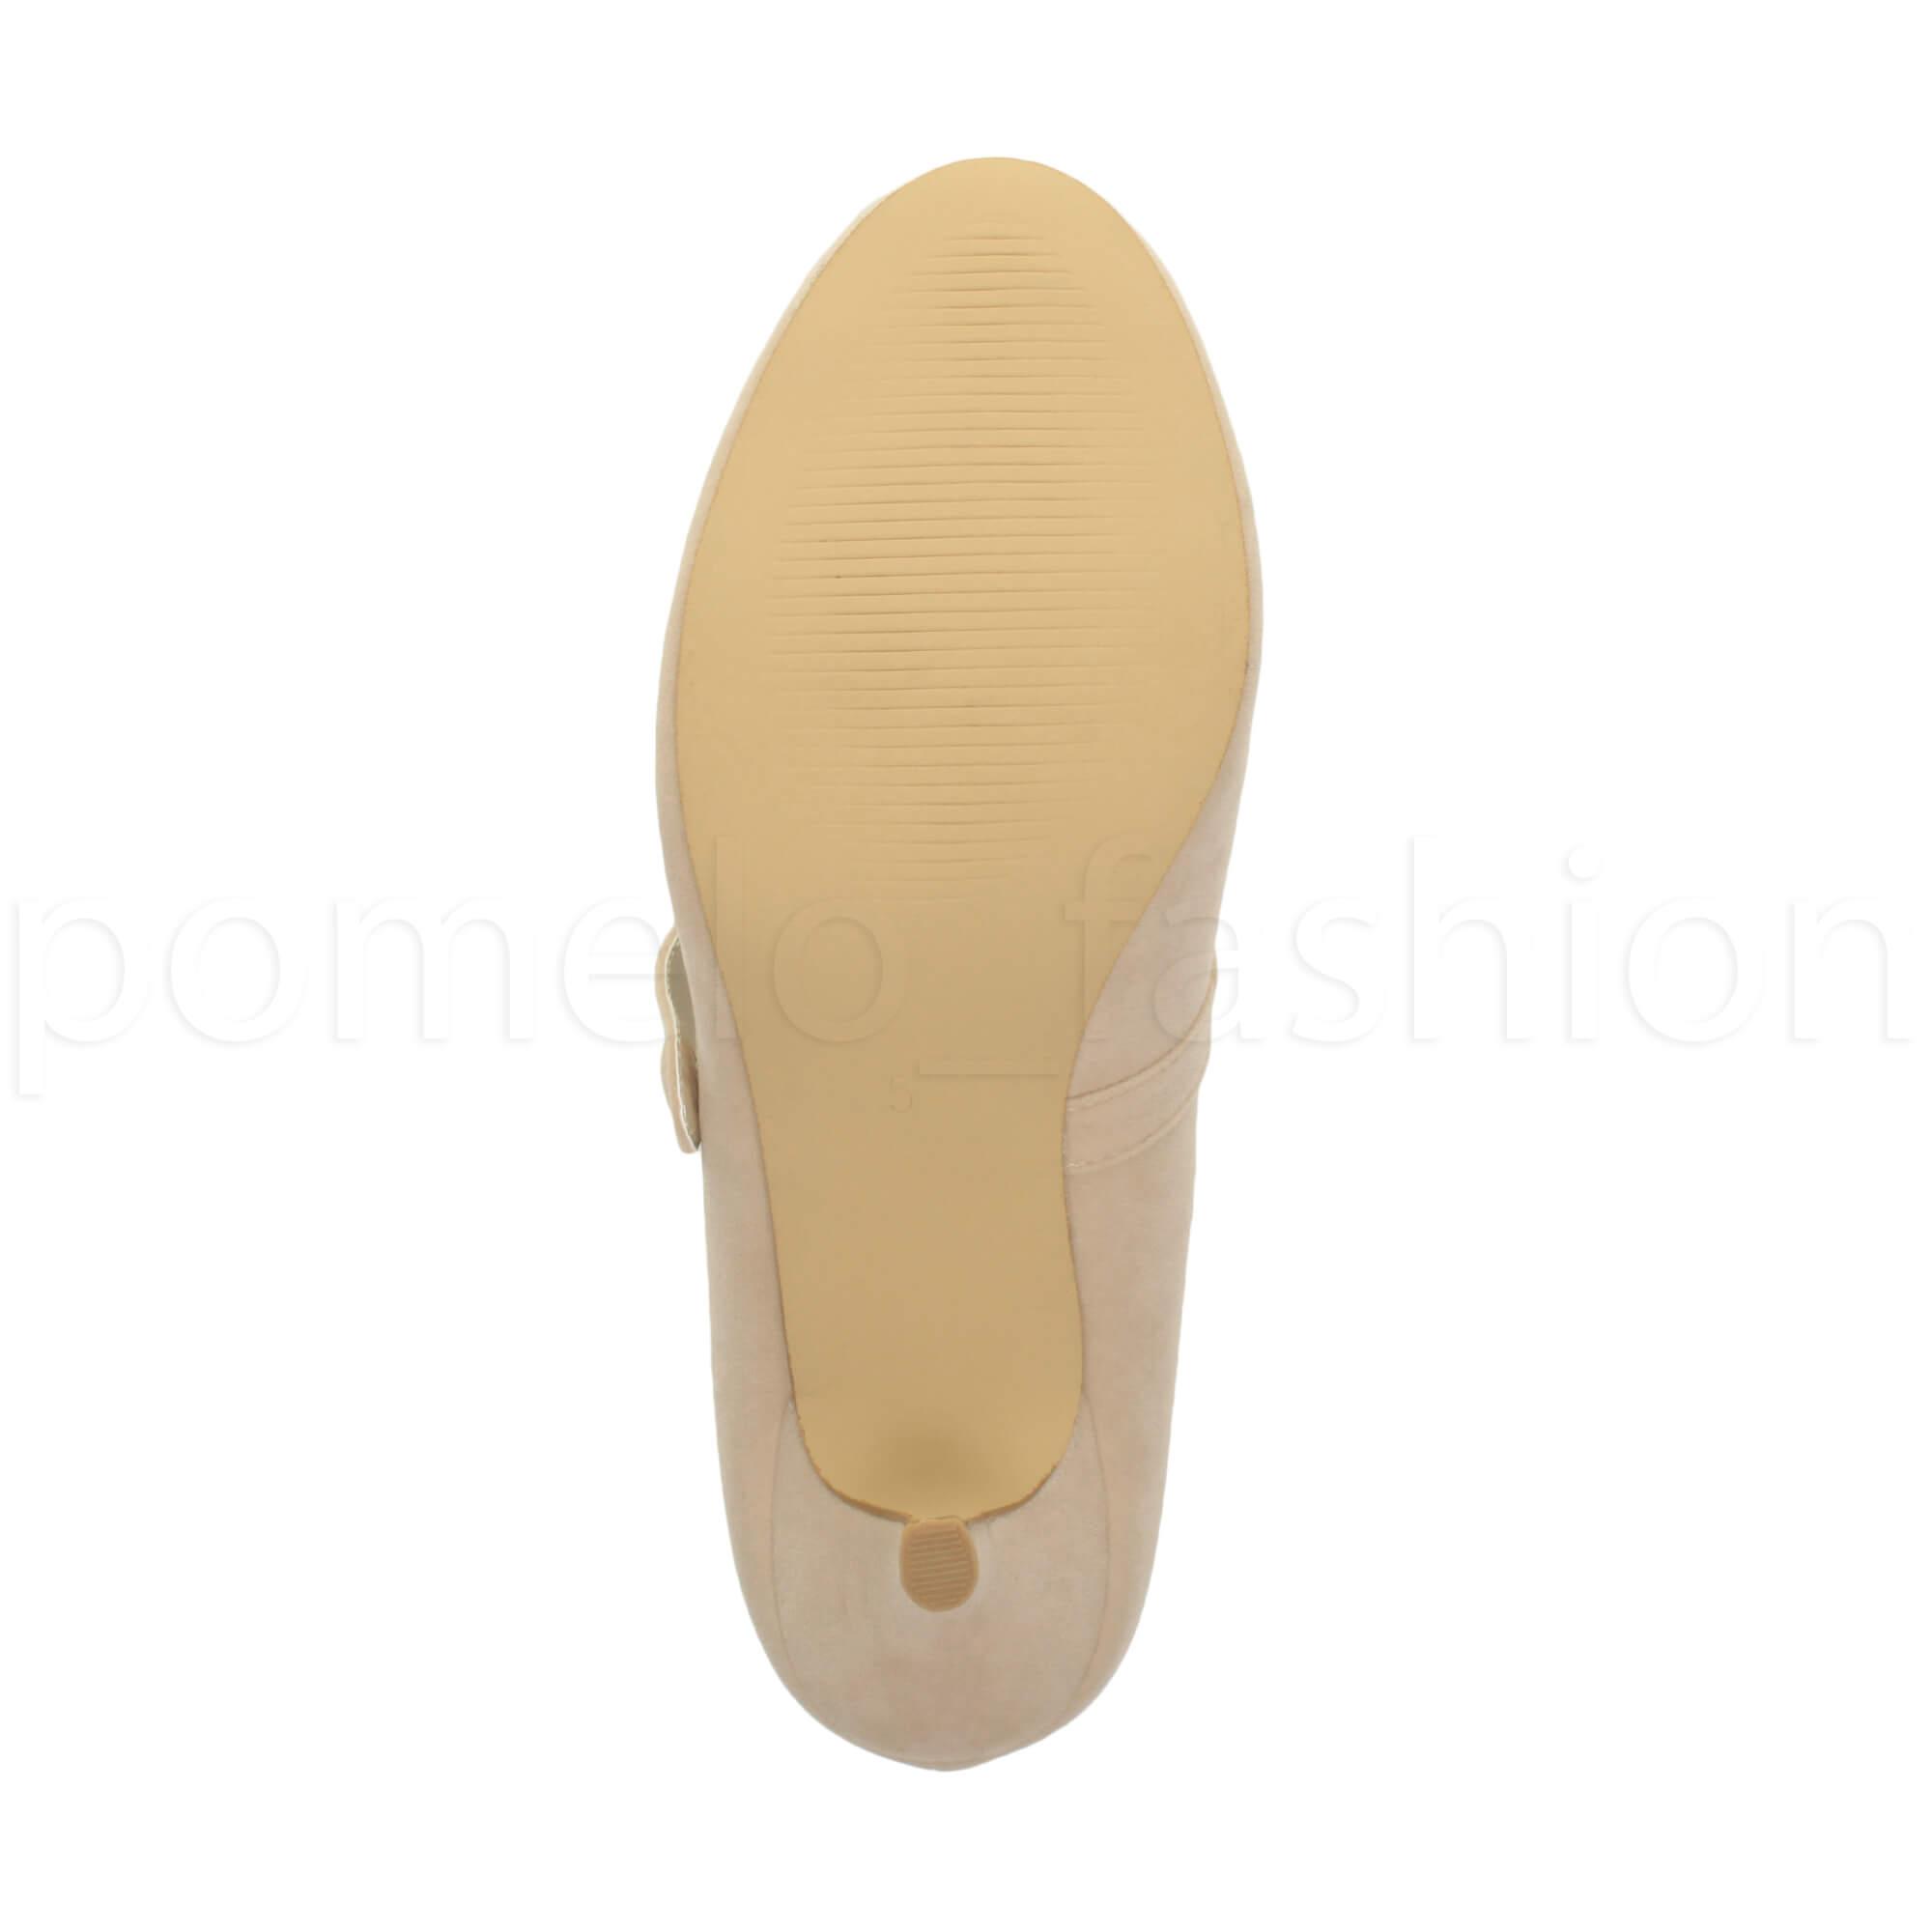 miniatura 127 - Donna basso tacco medio Mary Jane Damigella Matrimonio Pompe Scarpe Da Sera Taglia